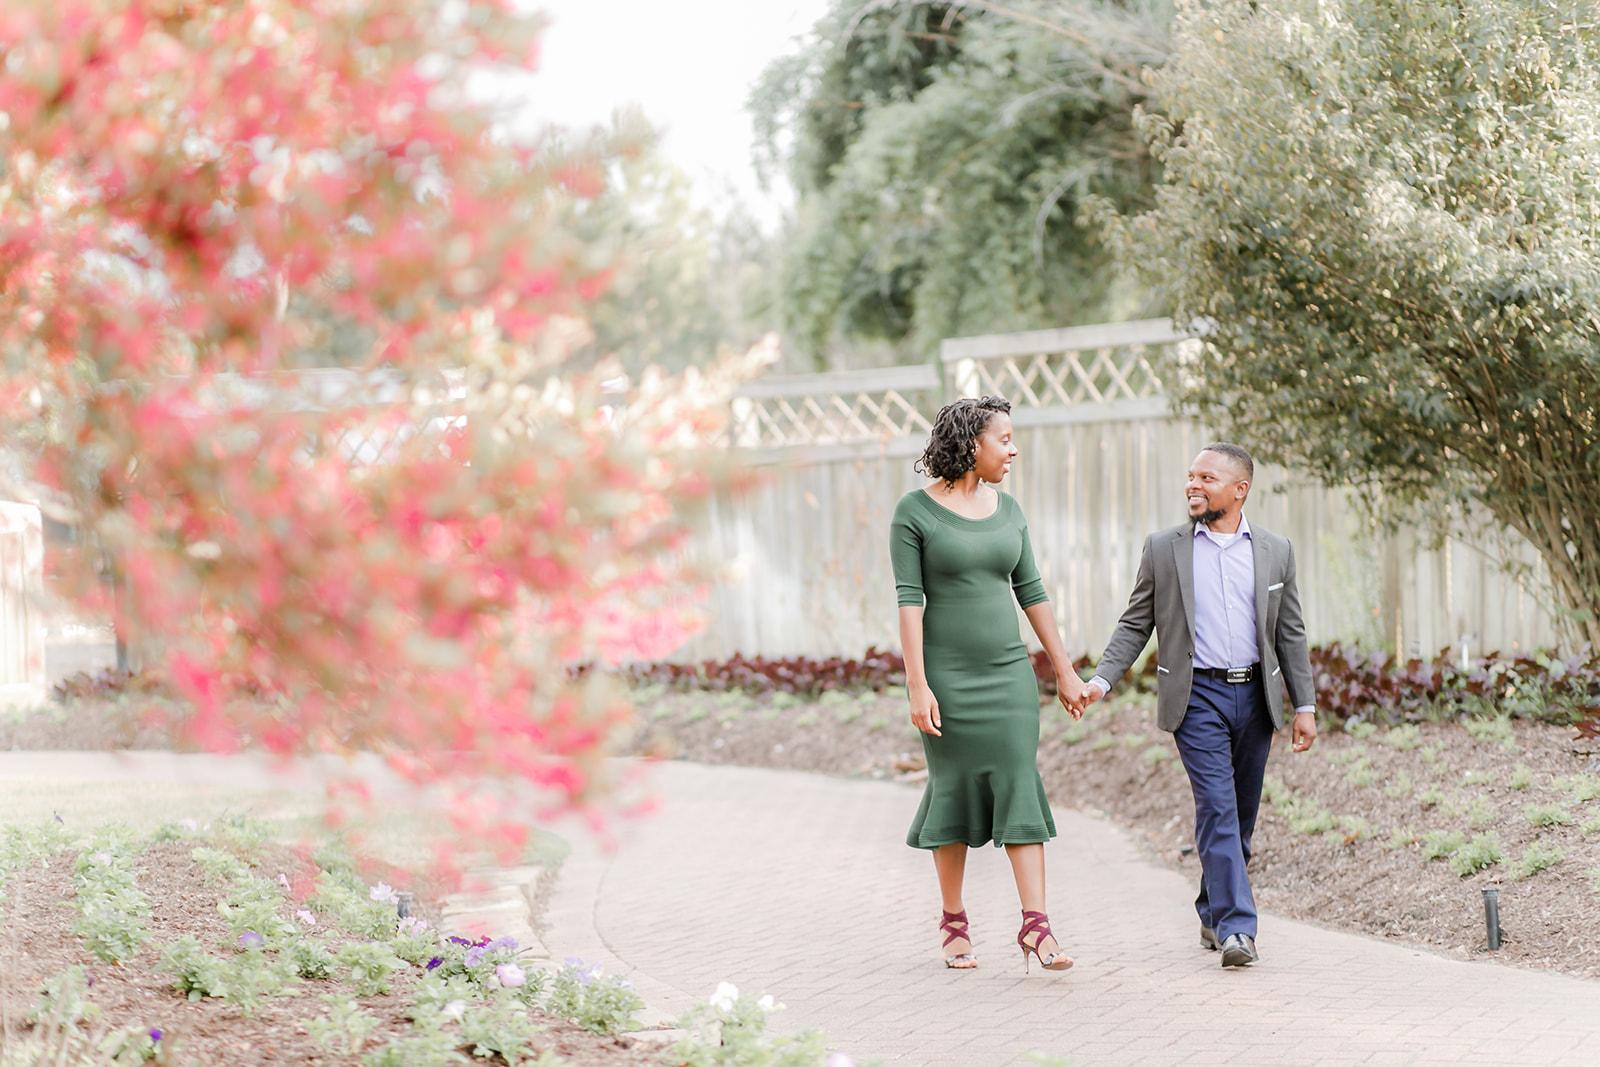 Aisle Society- Dalia + Pedro's Engagement